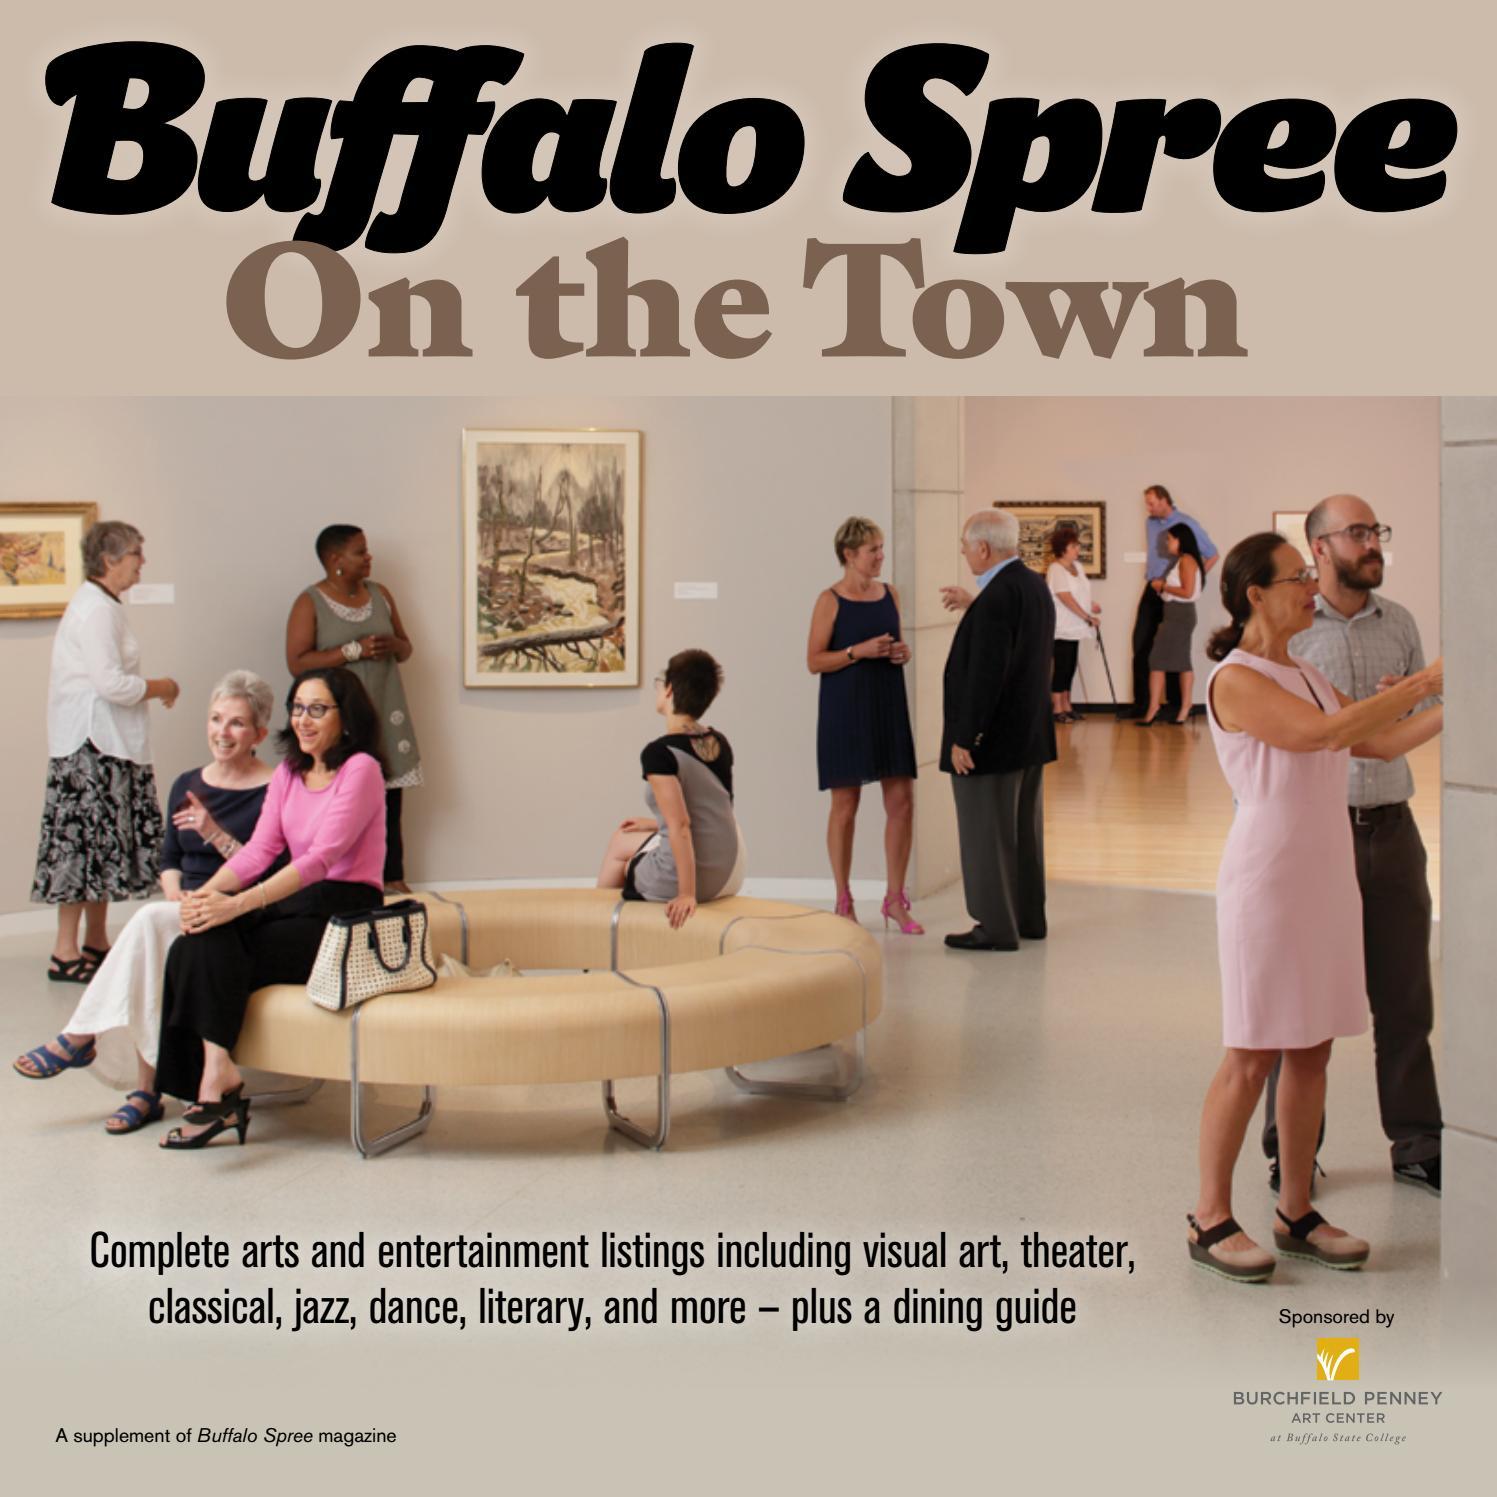 d64b1abcd Buffalo spree's on the town 2016 by Buffalo Spree - issuu